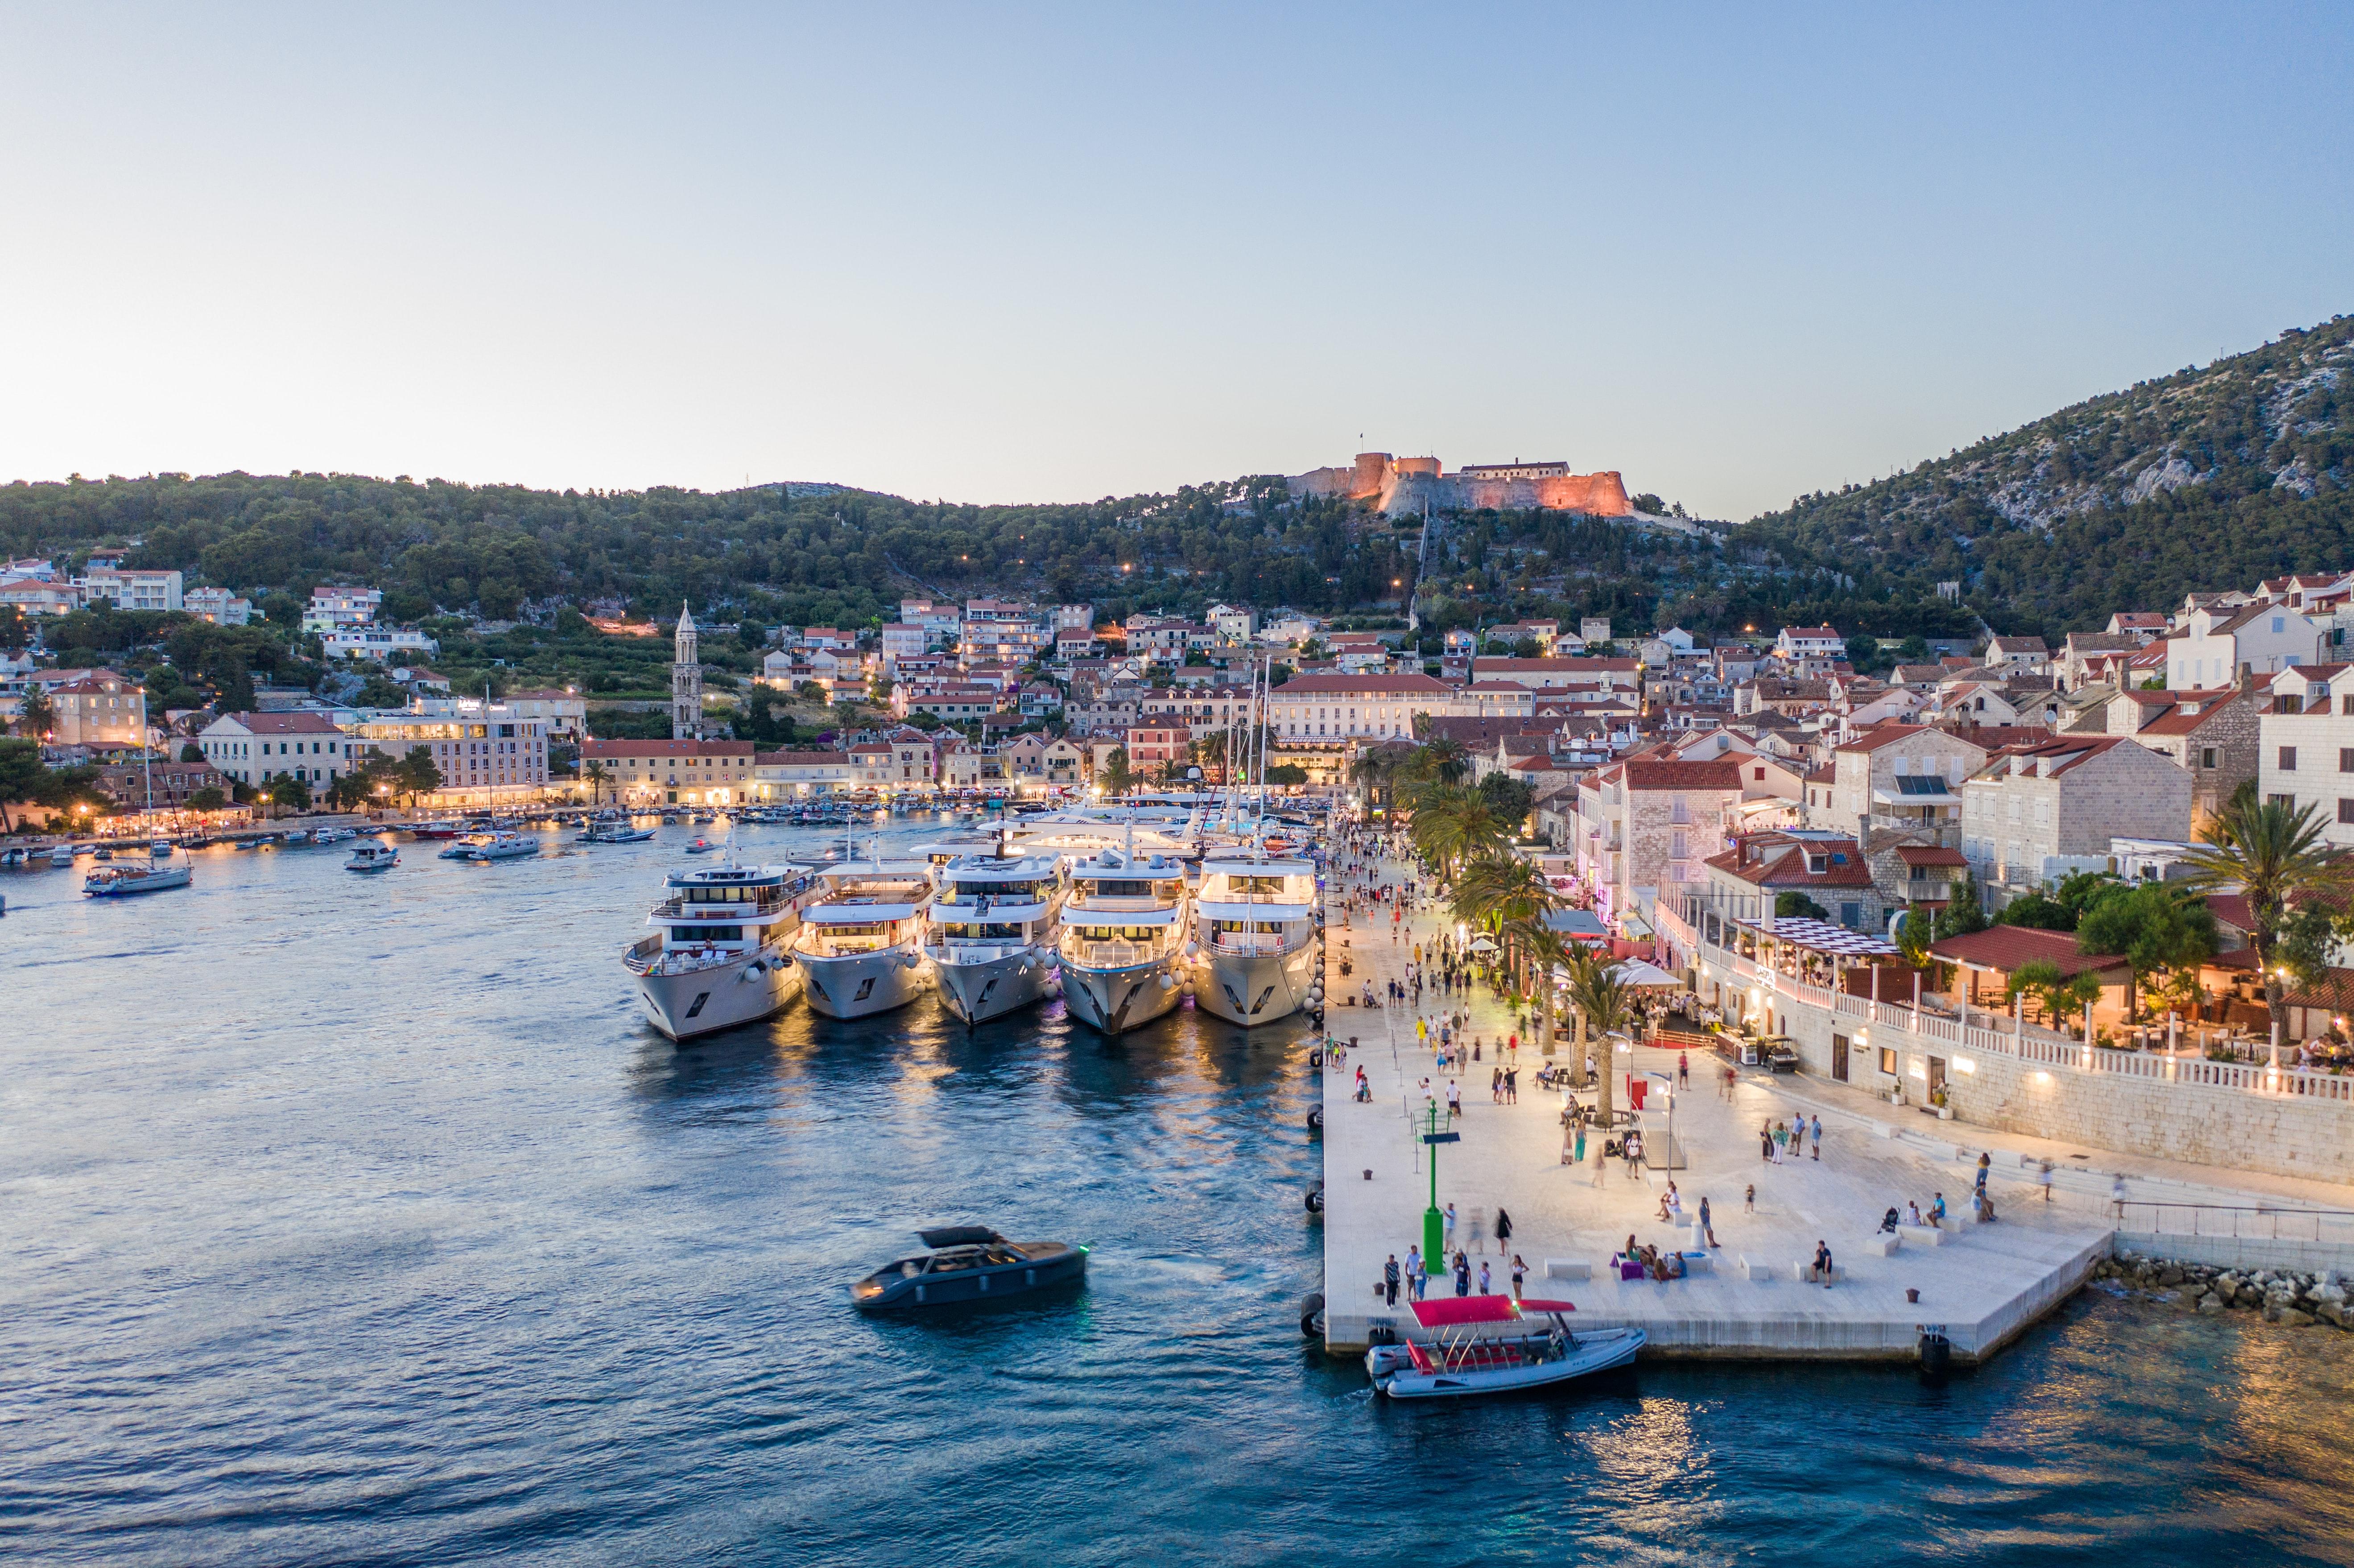 Hvar Island, Croatia Itinerary For 7 Days